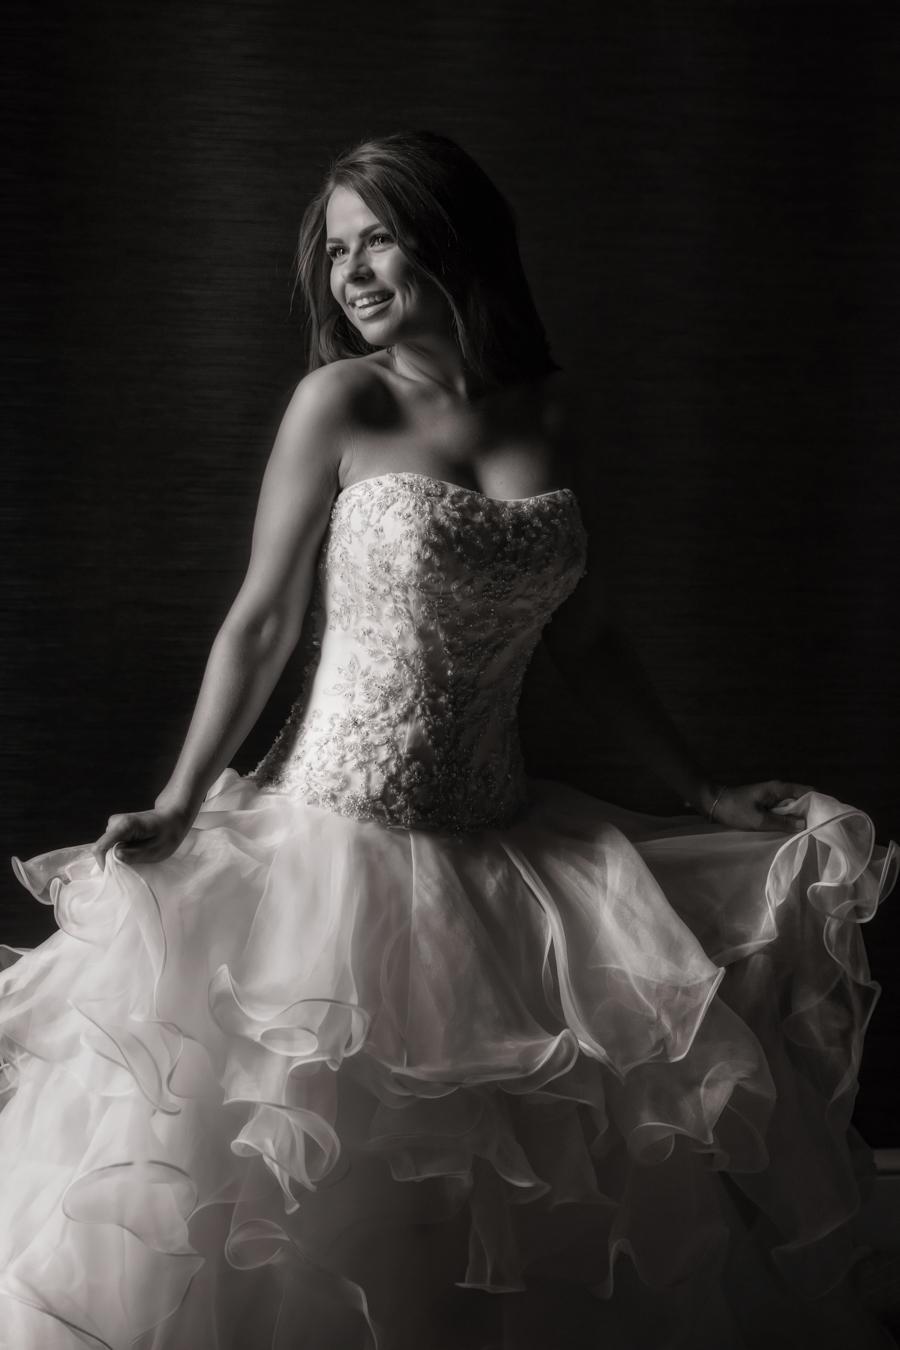 Wedding photographer winter wedding training course and wedding photographer portfolio day